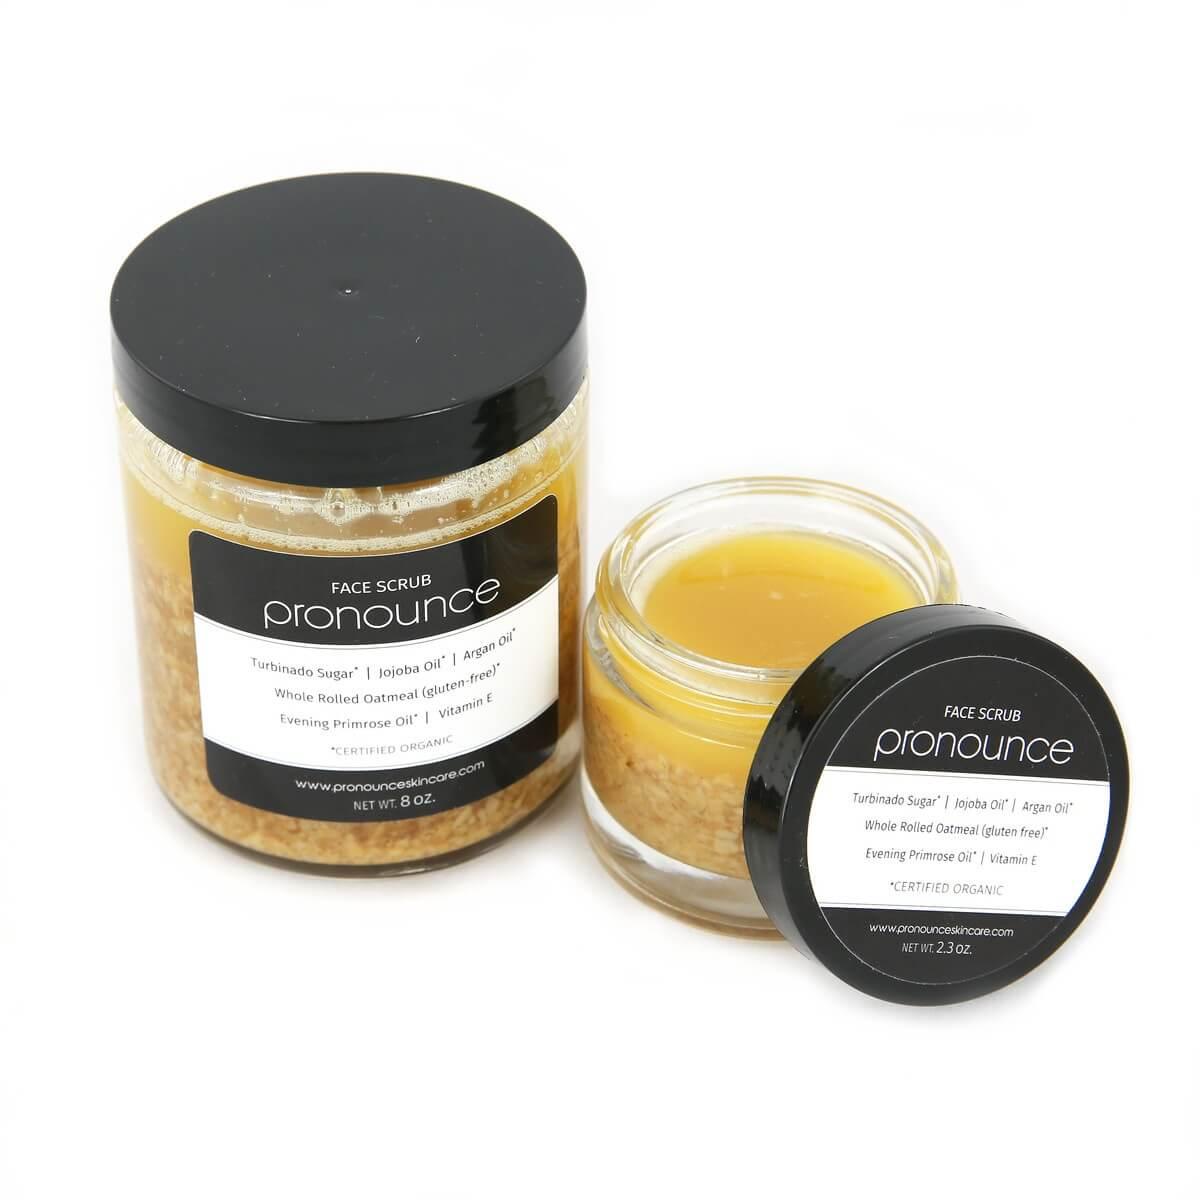 Face Scrub 2 Sizes Pronounce Skincare & Herbal Boutique-01